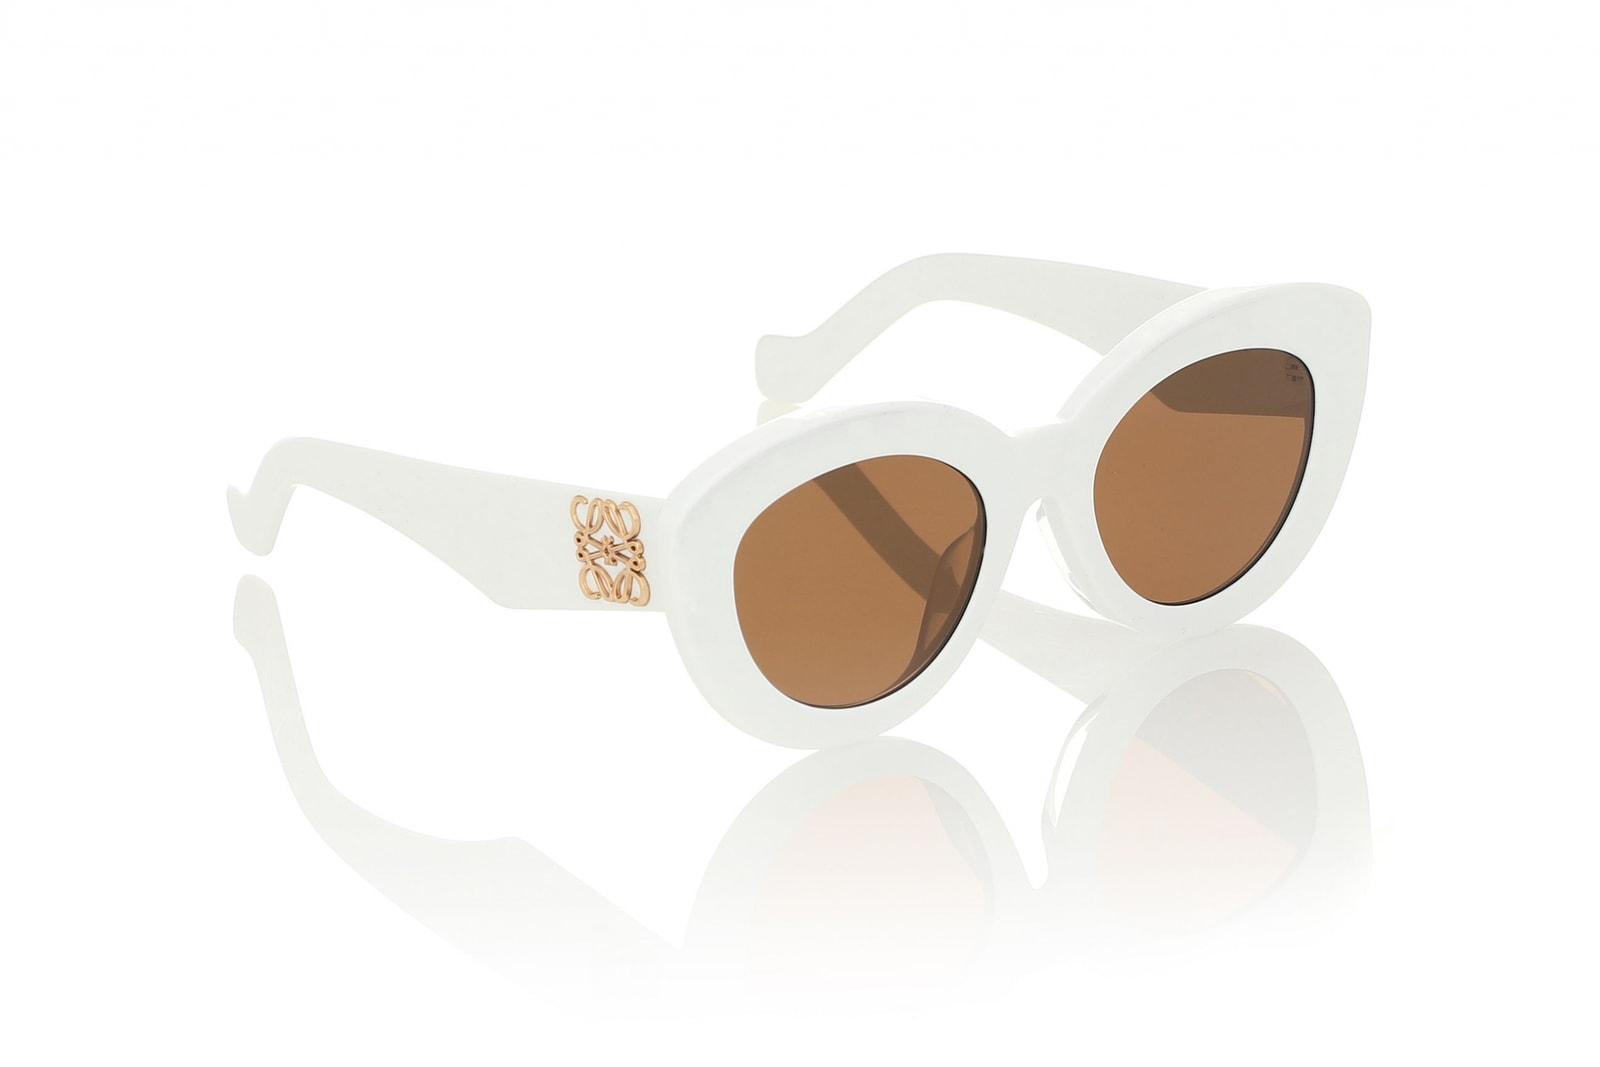 Best Spring/Summer Sunglasses Shades Lexxola Gucci Bottega Veneta Loewe Eyewear